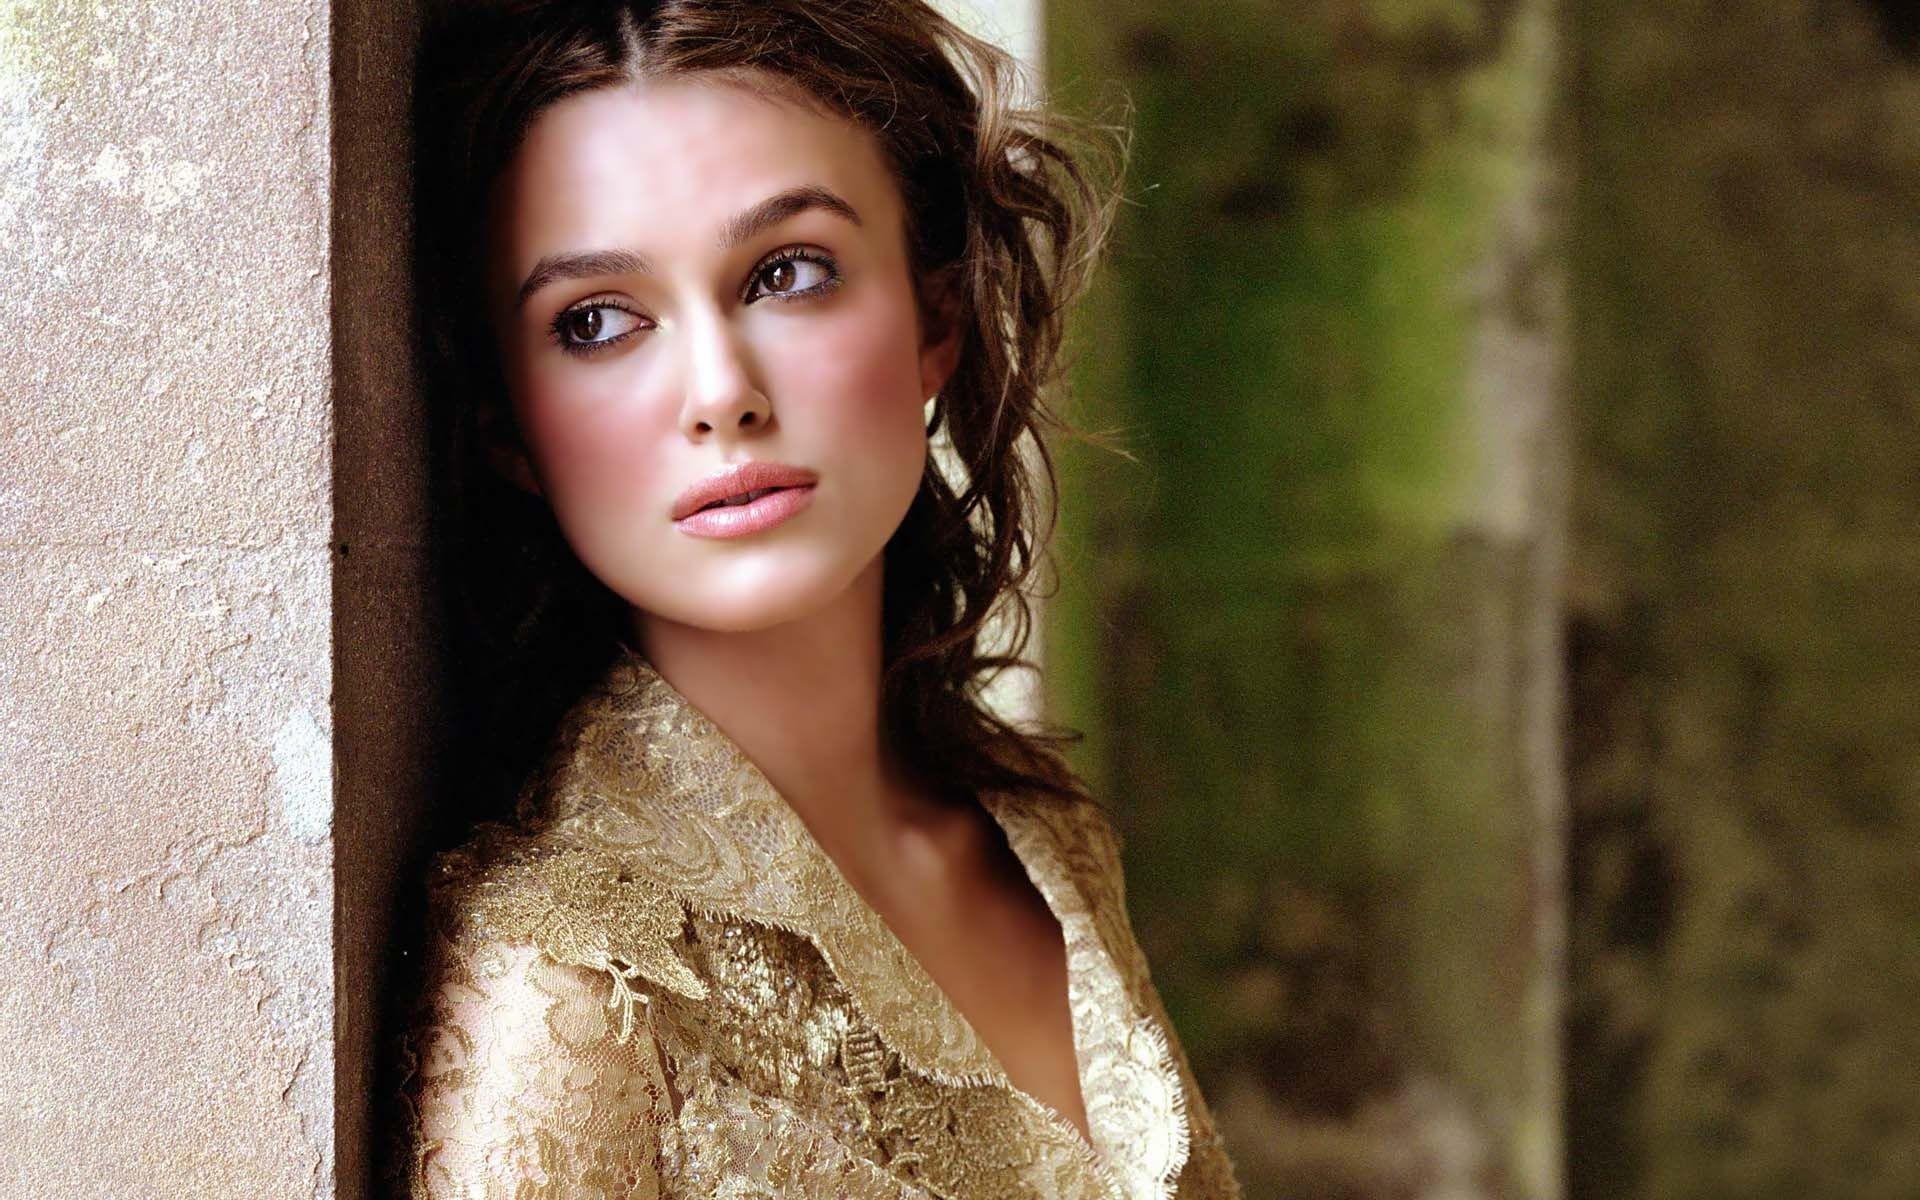 Full HD Wallpaper keira knightley brown eyes closeup face actress